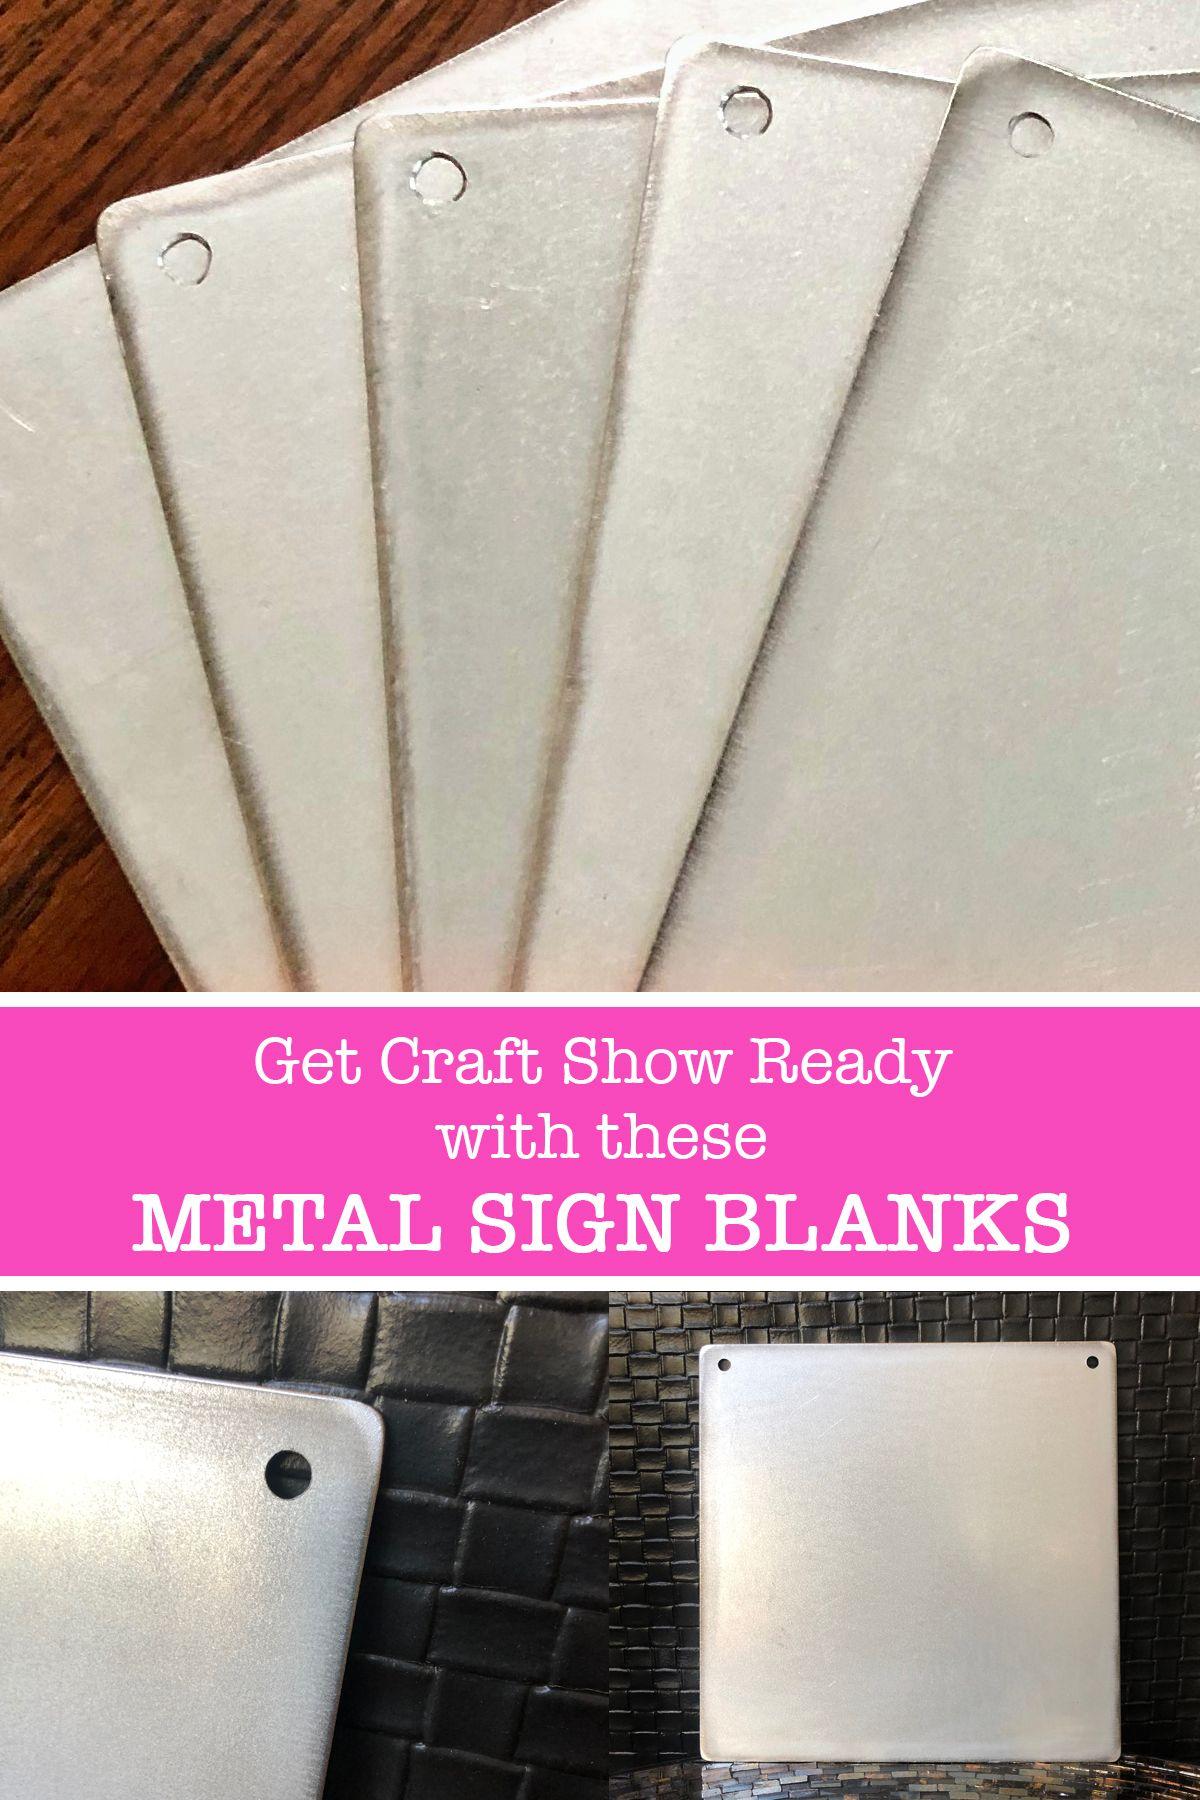 5 Square Metal Sign Blanks Metal Sign Blanks Blank Metal Signs For Vinyl Blank Signs For Sayings Galvanized Metal Sign Blanks Metal Signs Vinyl Blanks Blank Sign